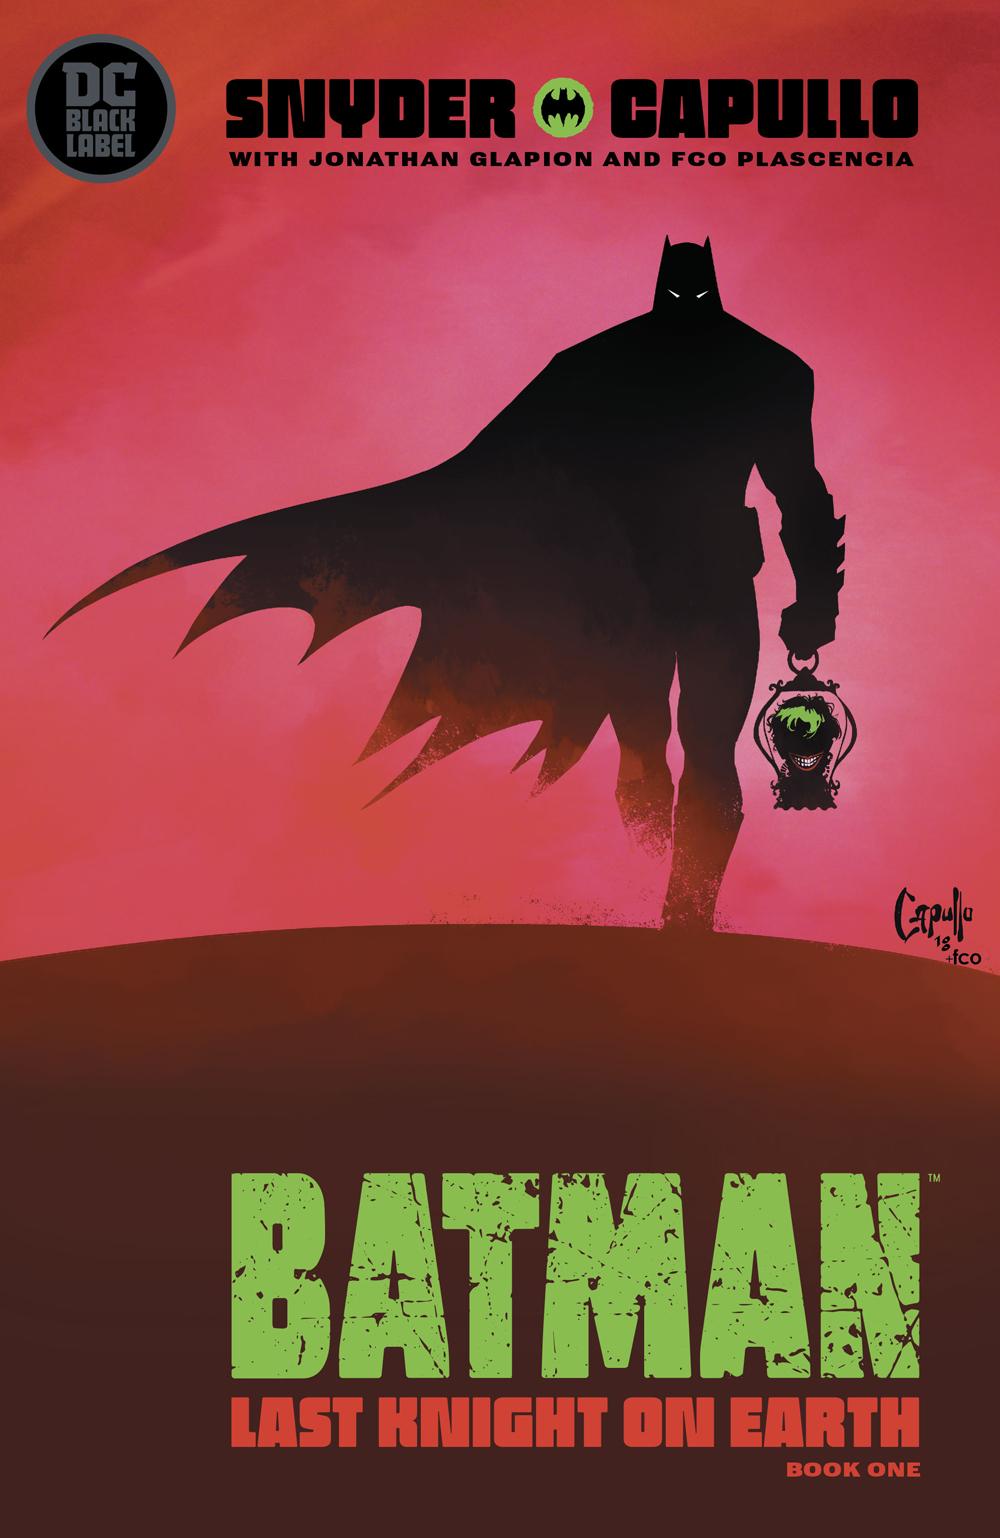 BatmanLastKnight.jpg